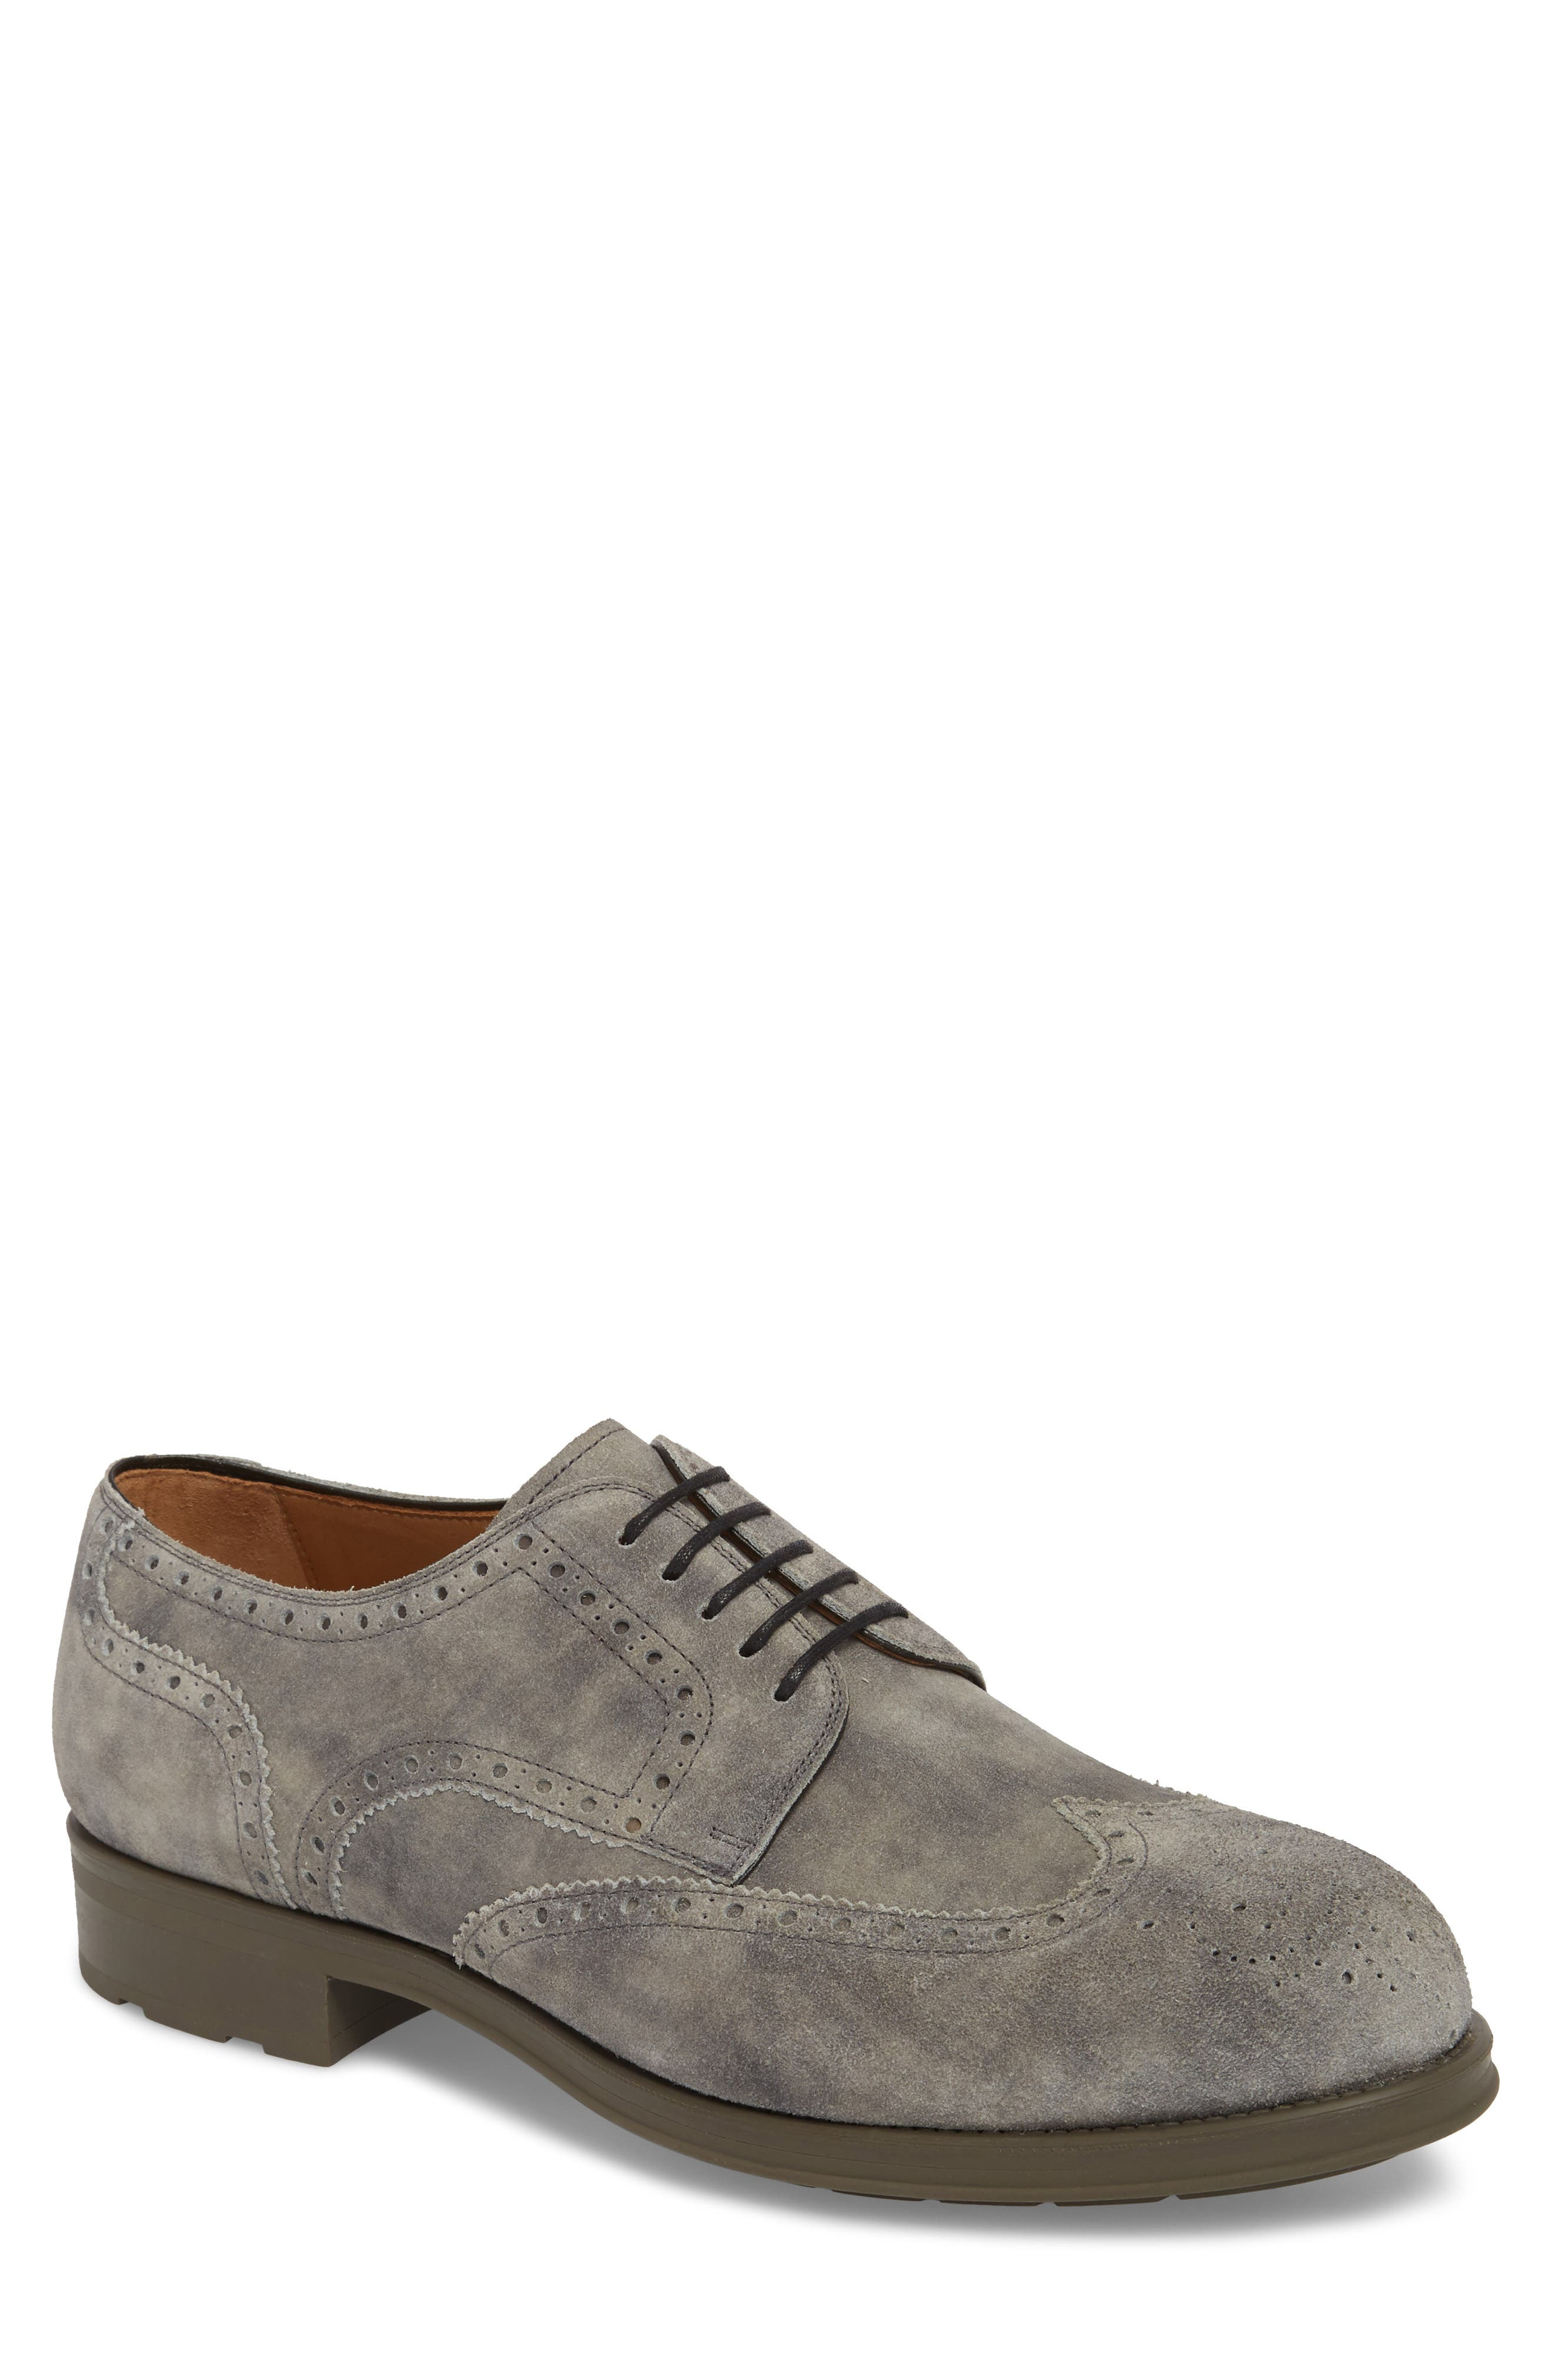 Tormo Wingtip,                         Main,                         color, Grey Leather